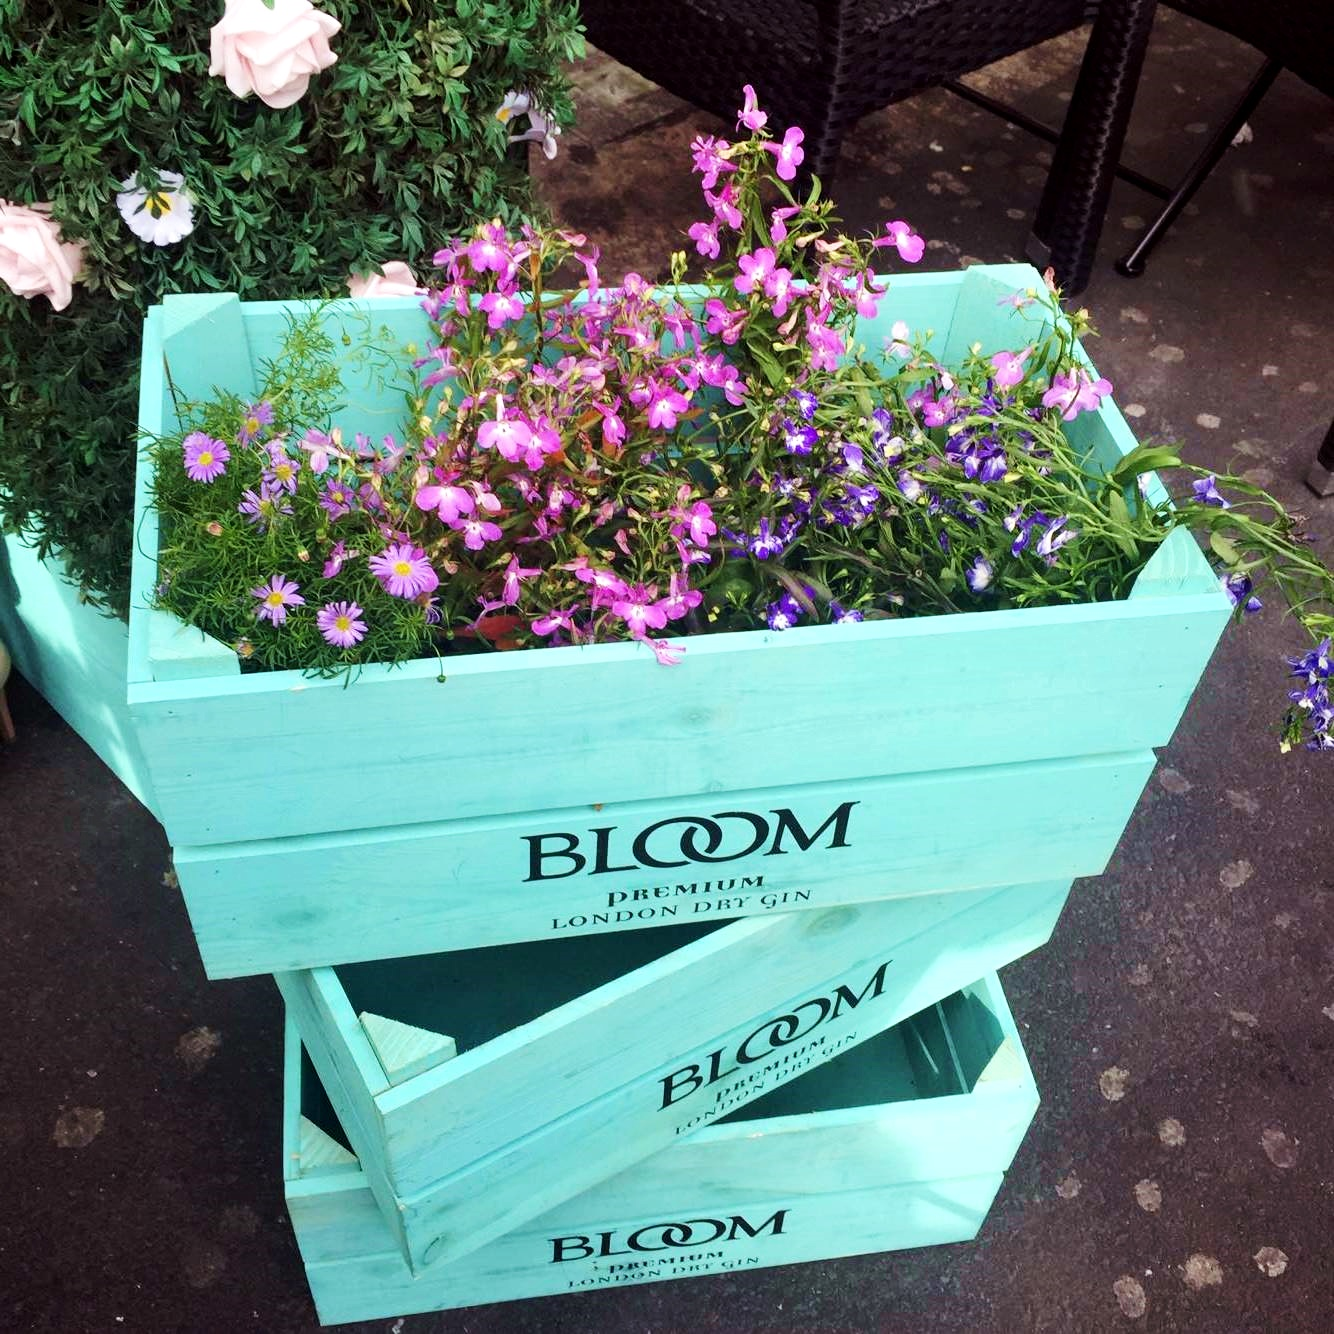 bloom gin terrace rosylee manchester